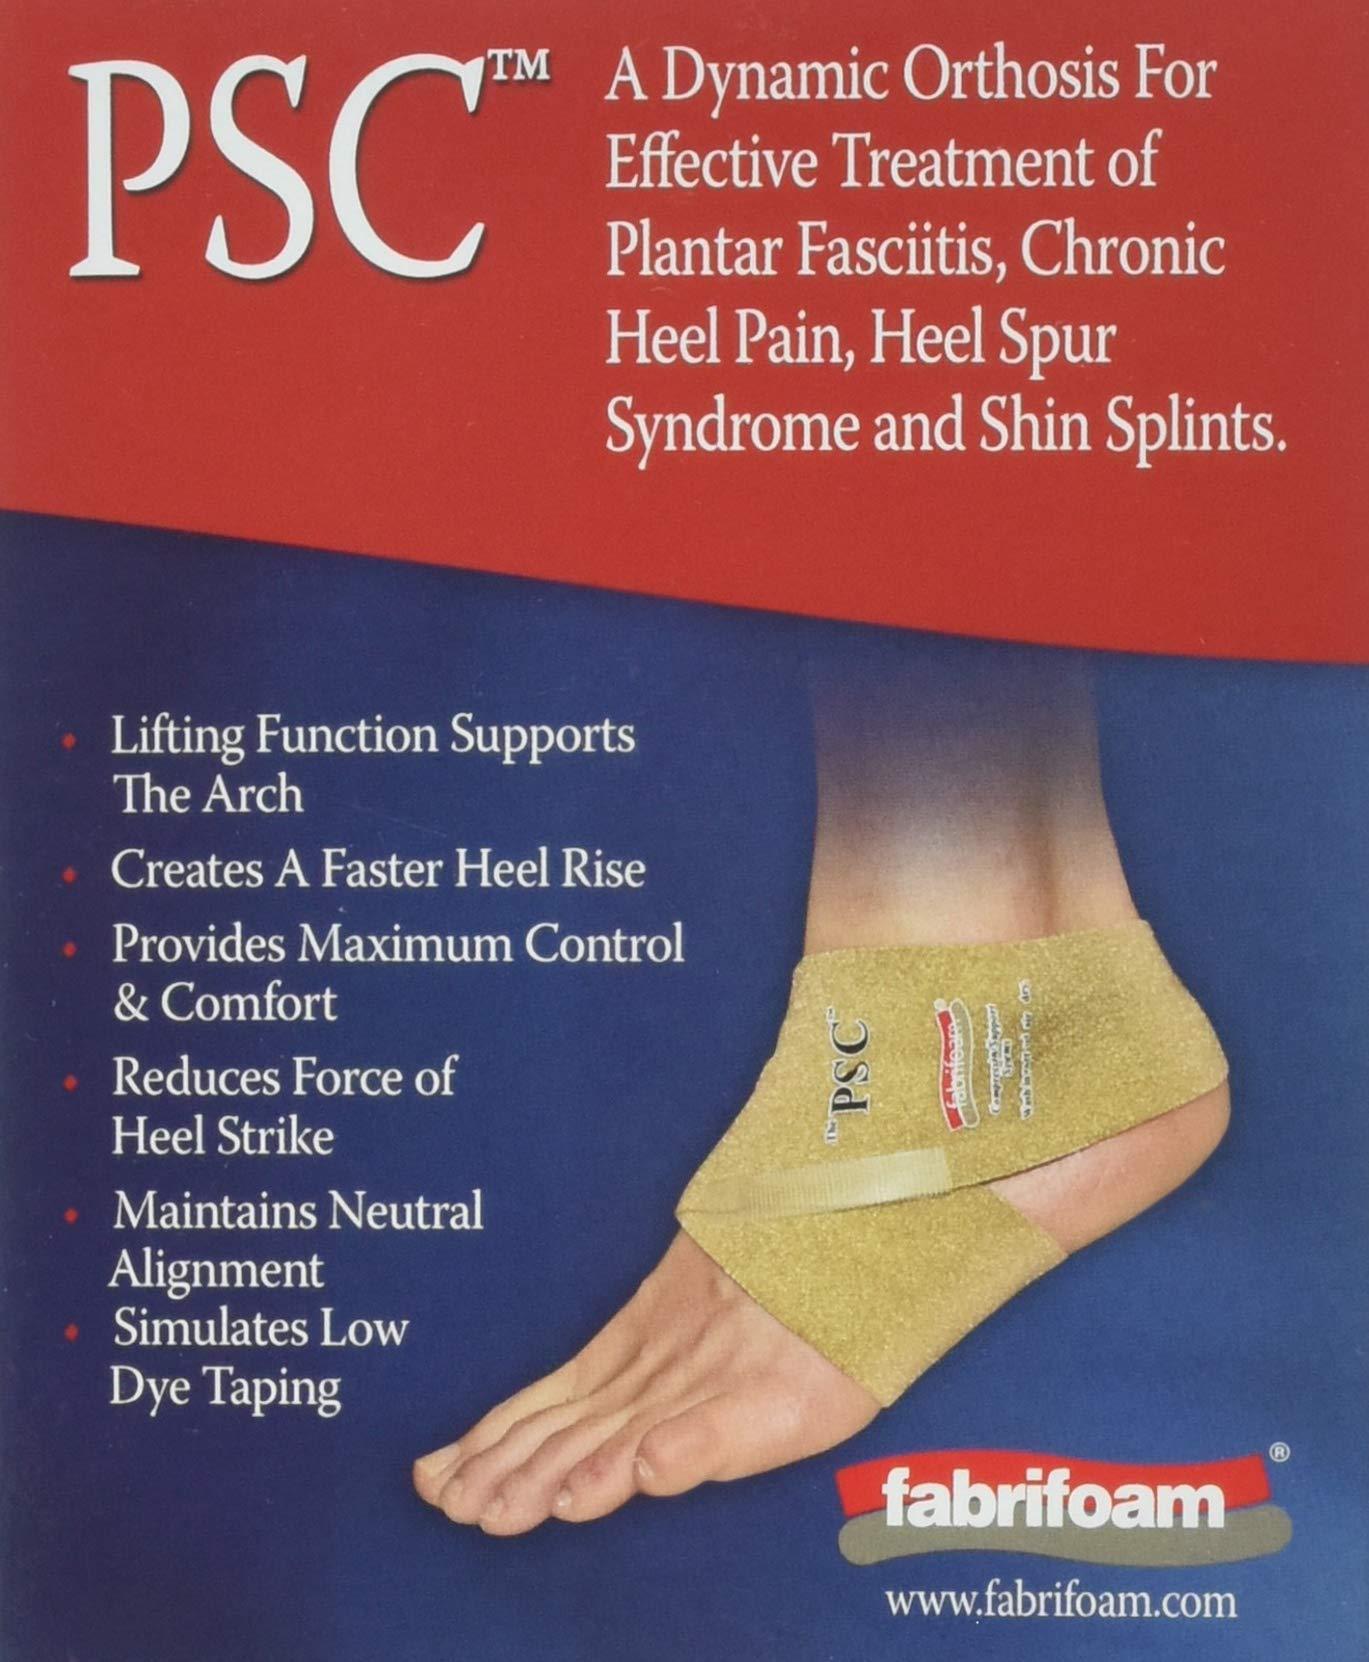 Fabrifoam Pronation Spring Control (PSC) Device, Left Small